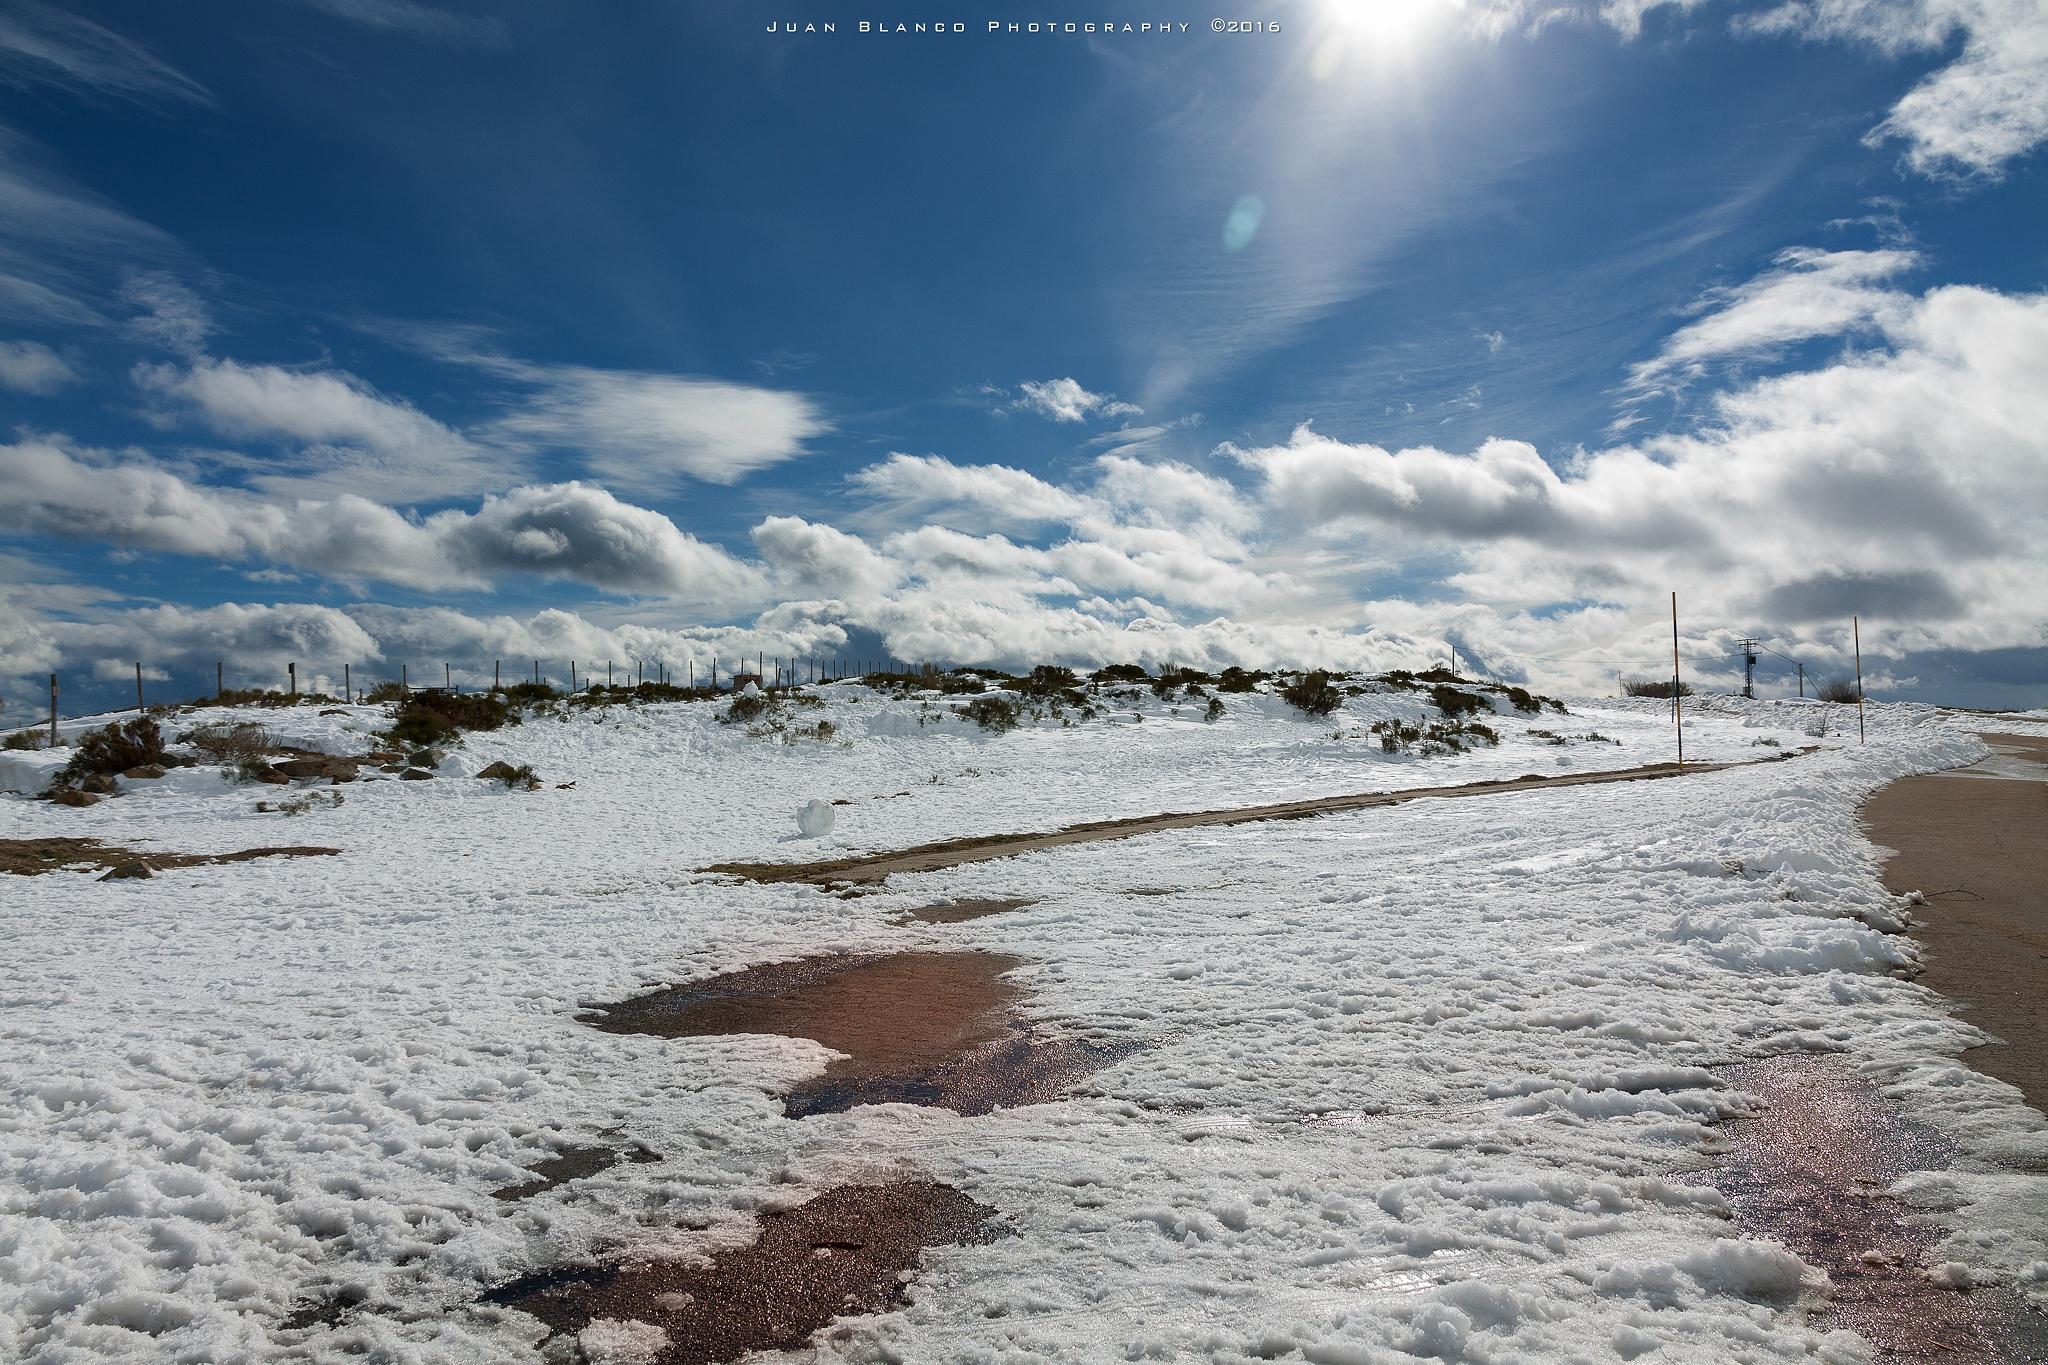 Golobar   Brañosera   Palencia   2016 by JuanBlancoPhotography